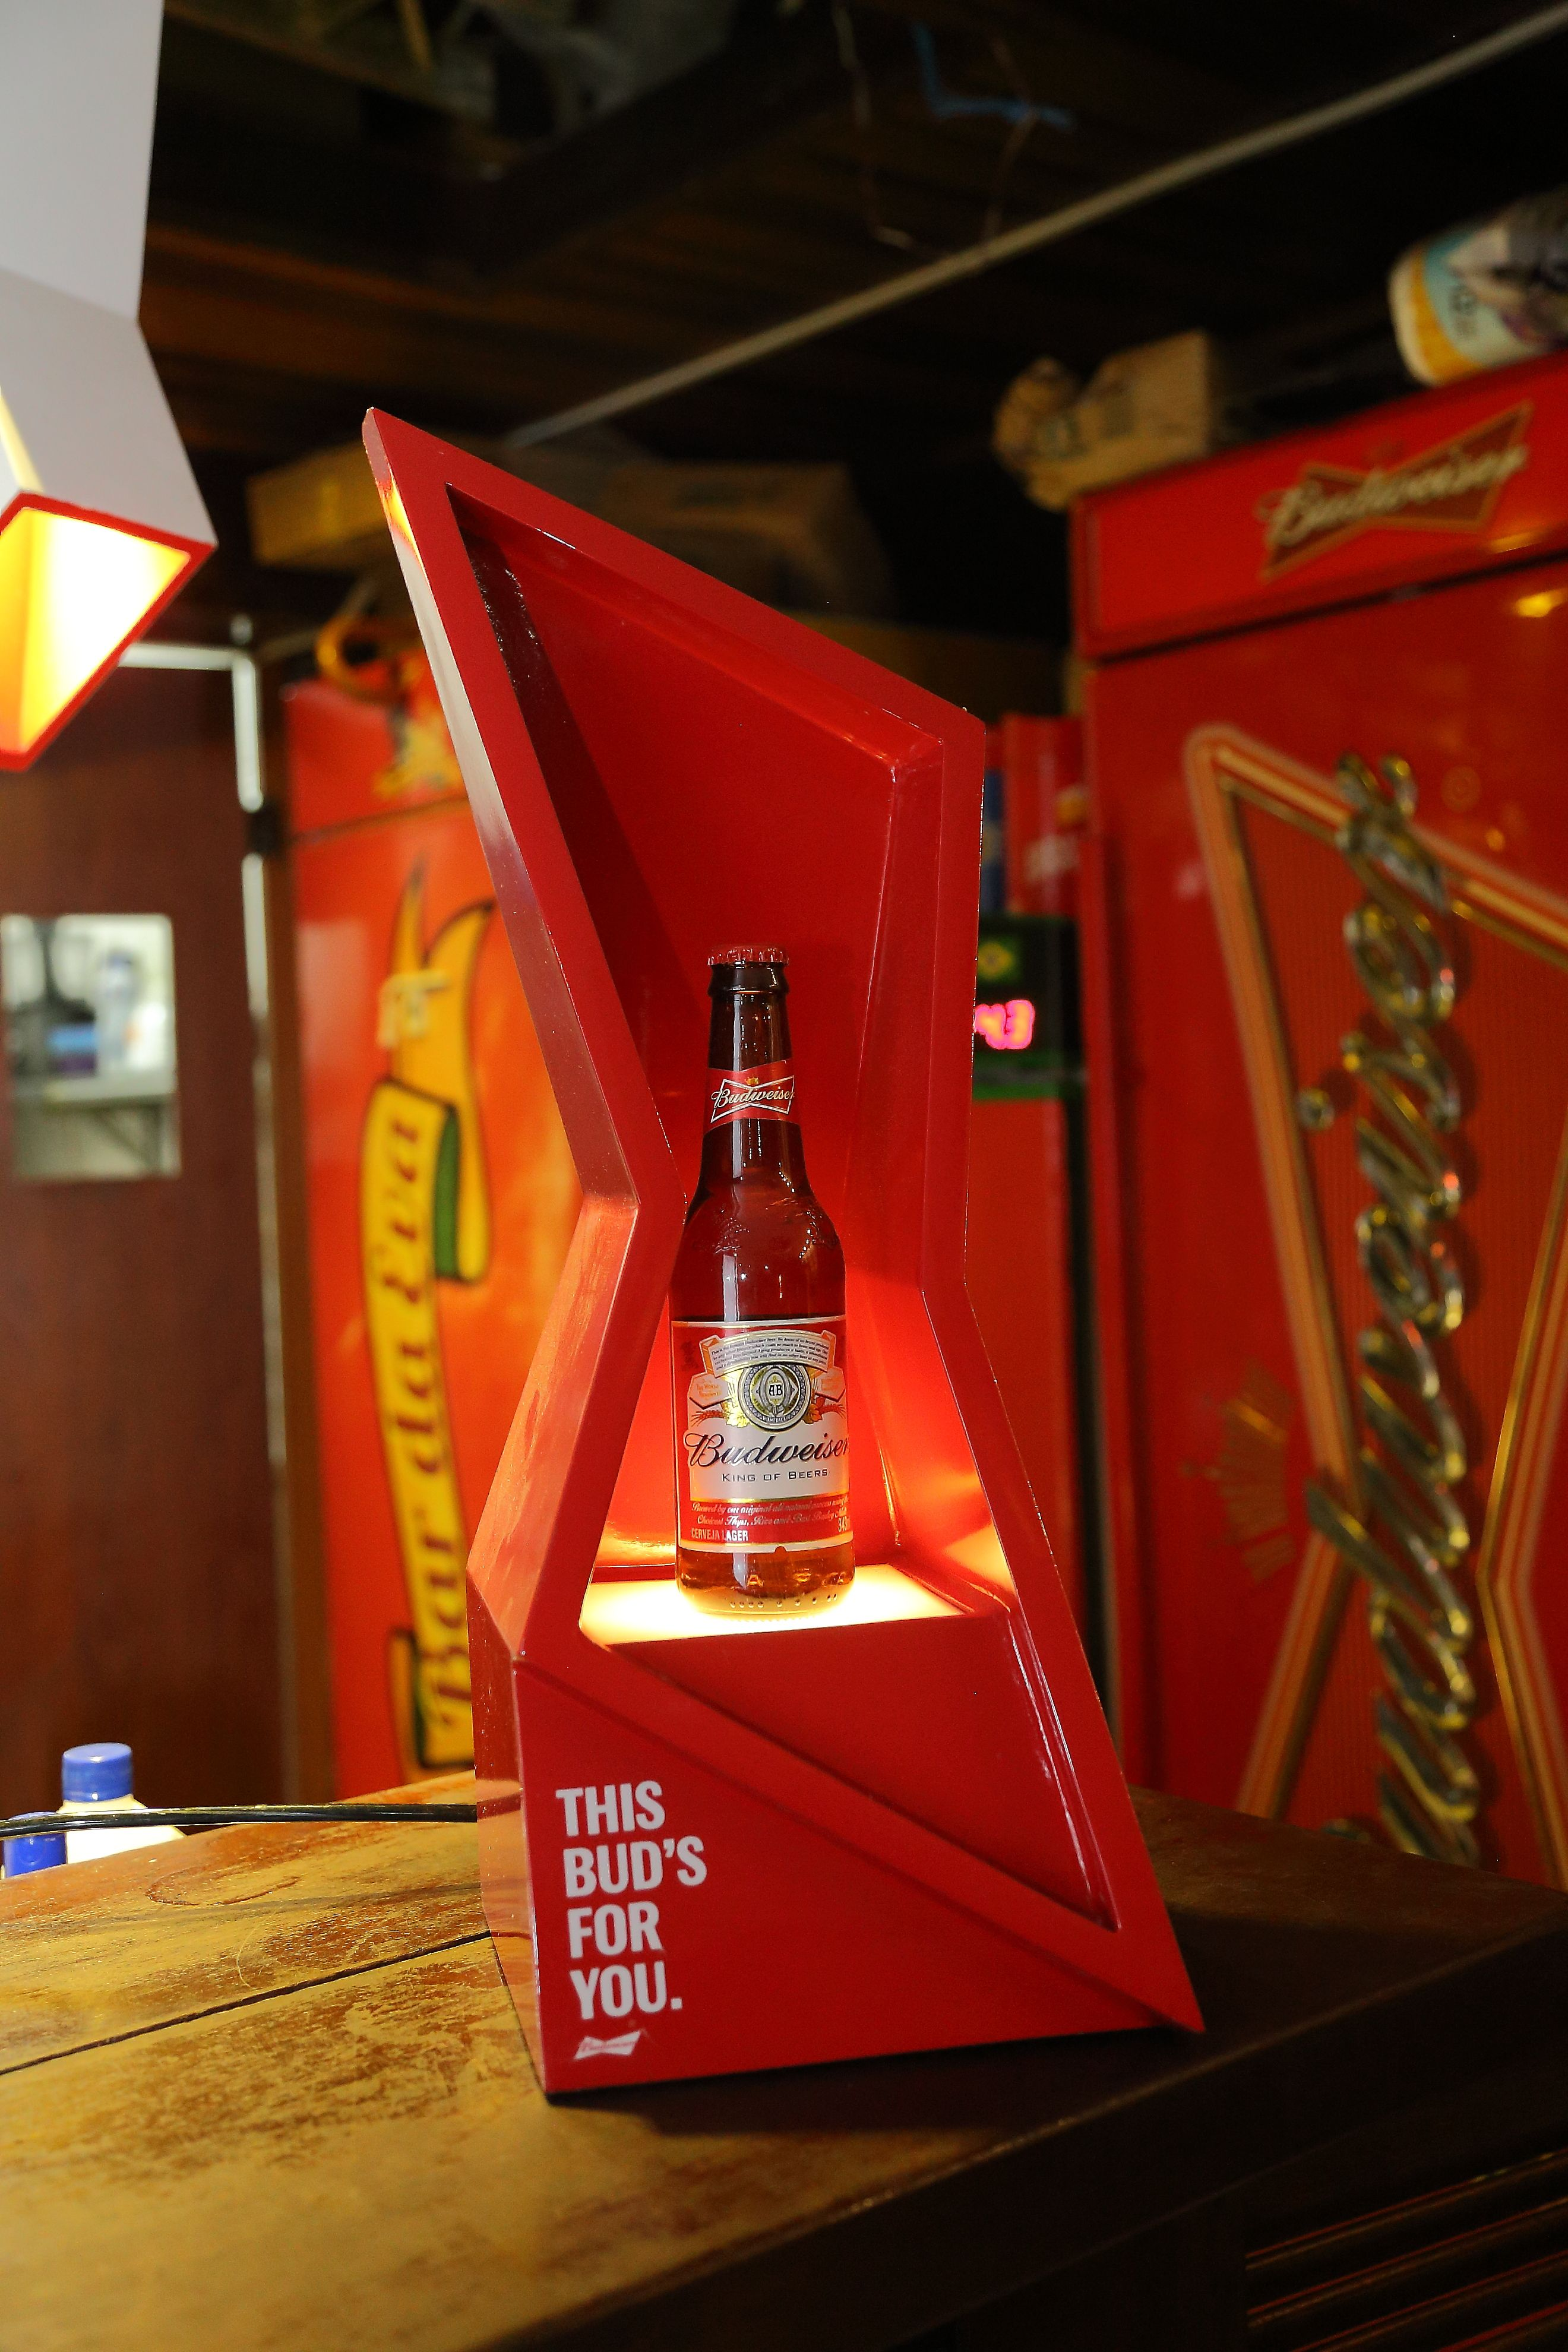 O Bar Da Eva Localizado No Rio De Janeiro Recebeu Pecas Do Tailor Made Da Budweiser Desenvolvido Pela Agencia Ioio Dish Soap Bottle Budweiser Whiskey Bottle